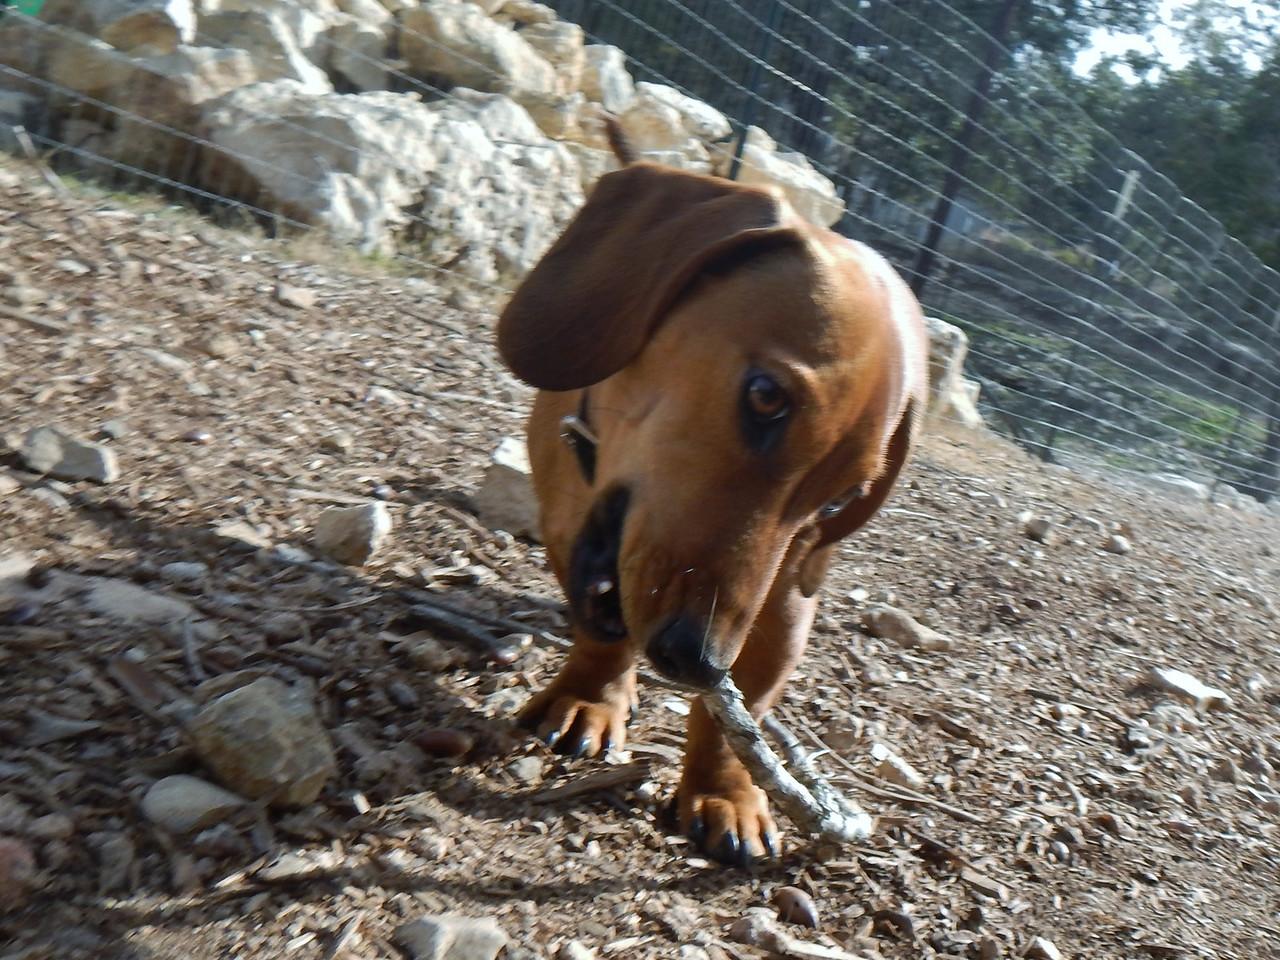 Sully found a stick